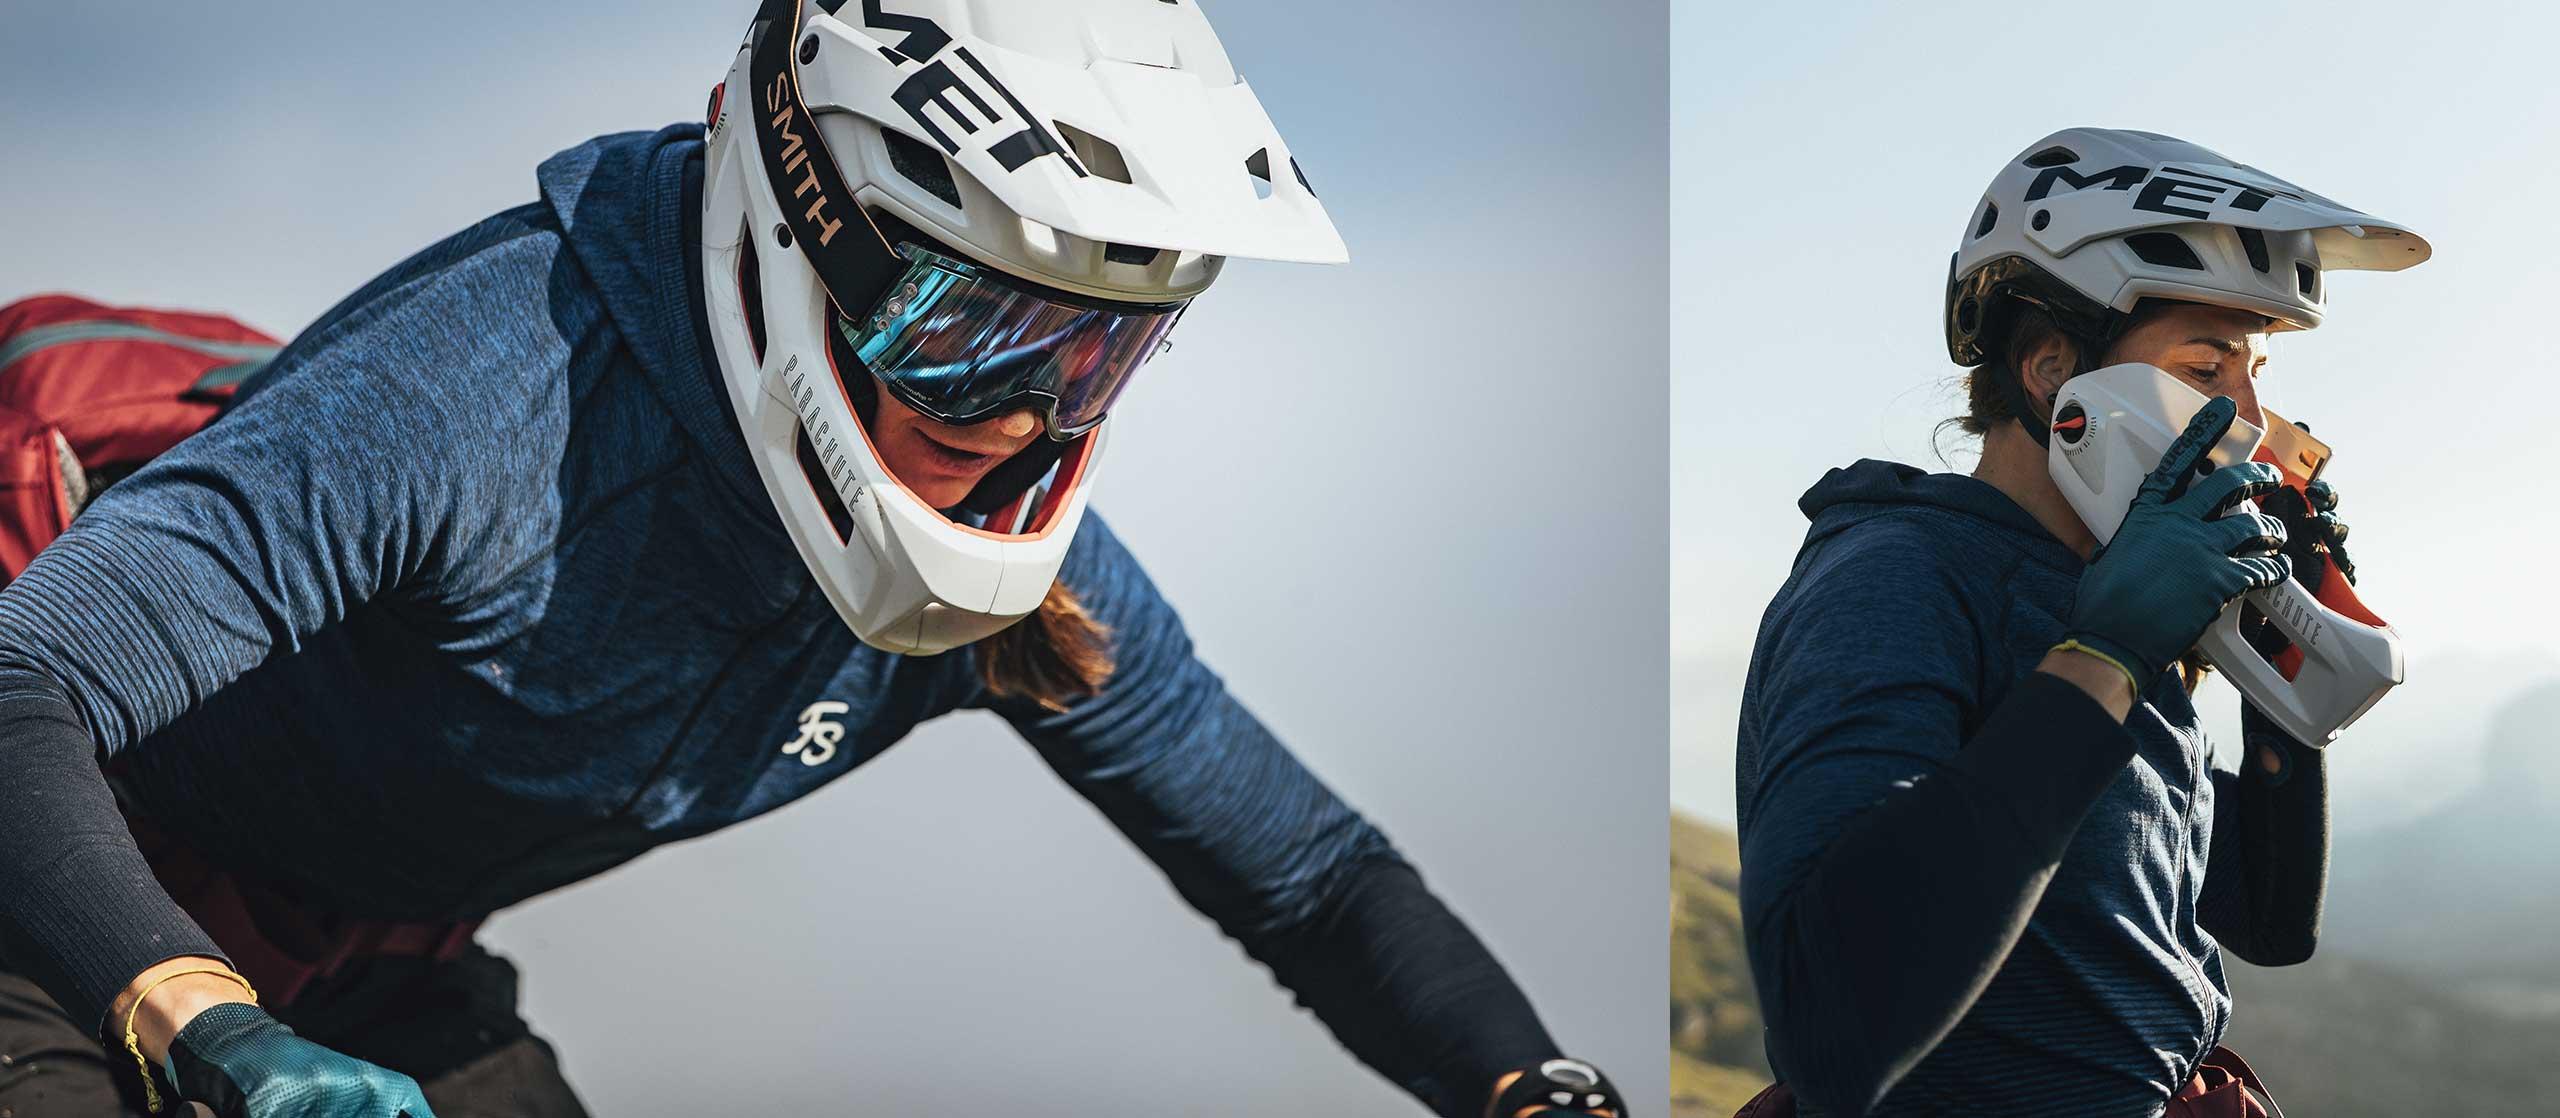 MET Parachute MCR mips Enduro, Trail and E-MTB Convertible Helmet